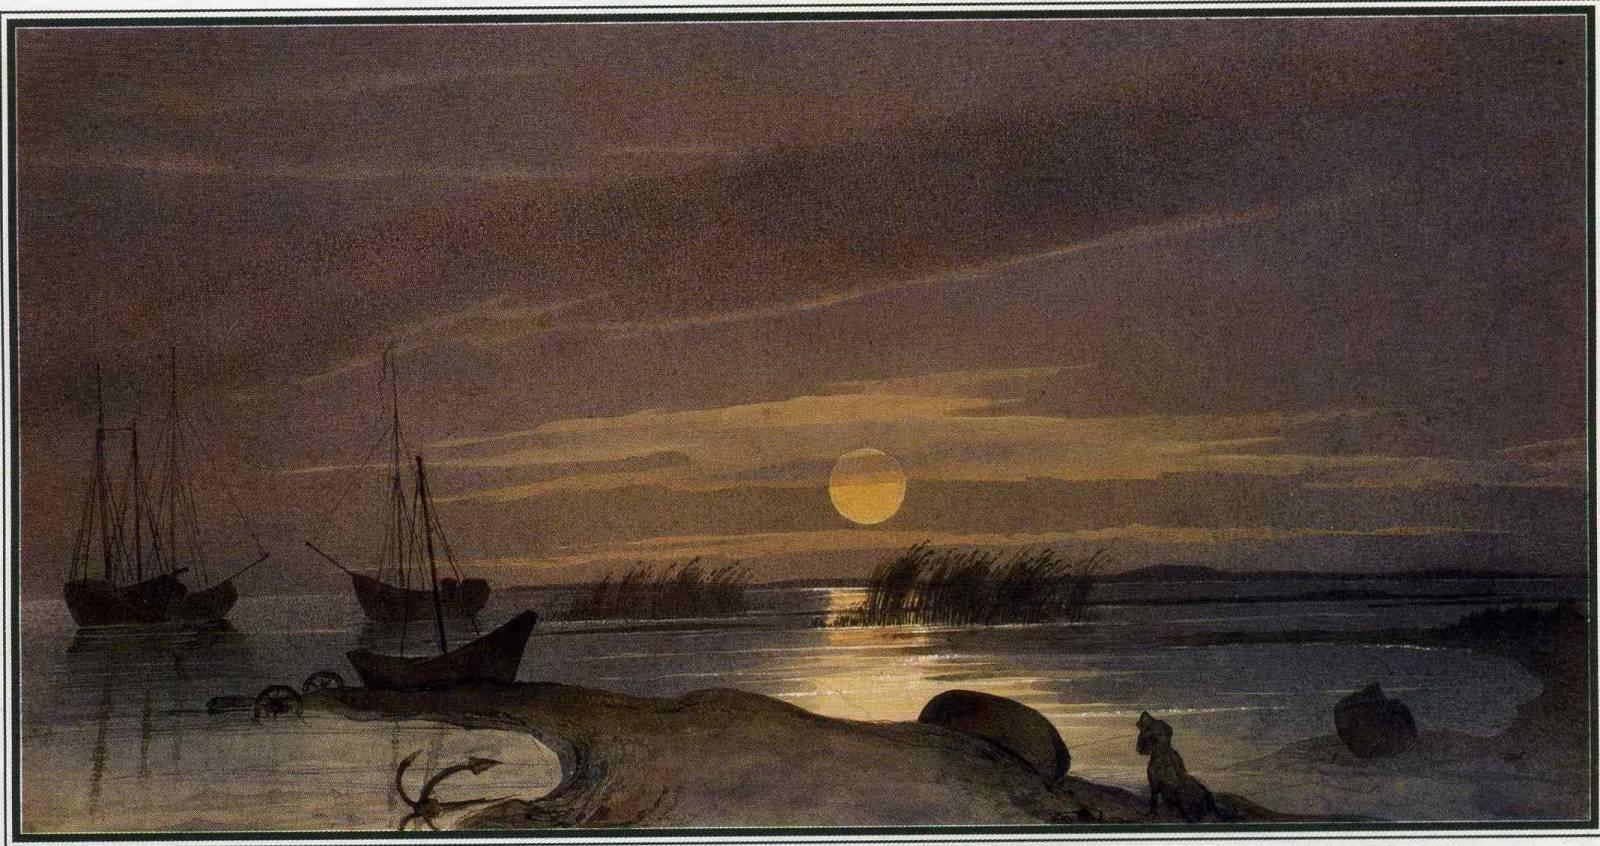 Місячна ніч на Косаралі